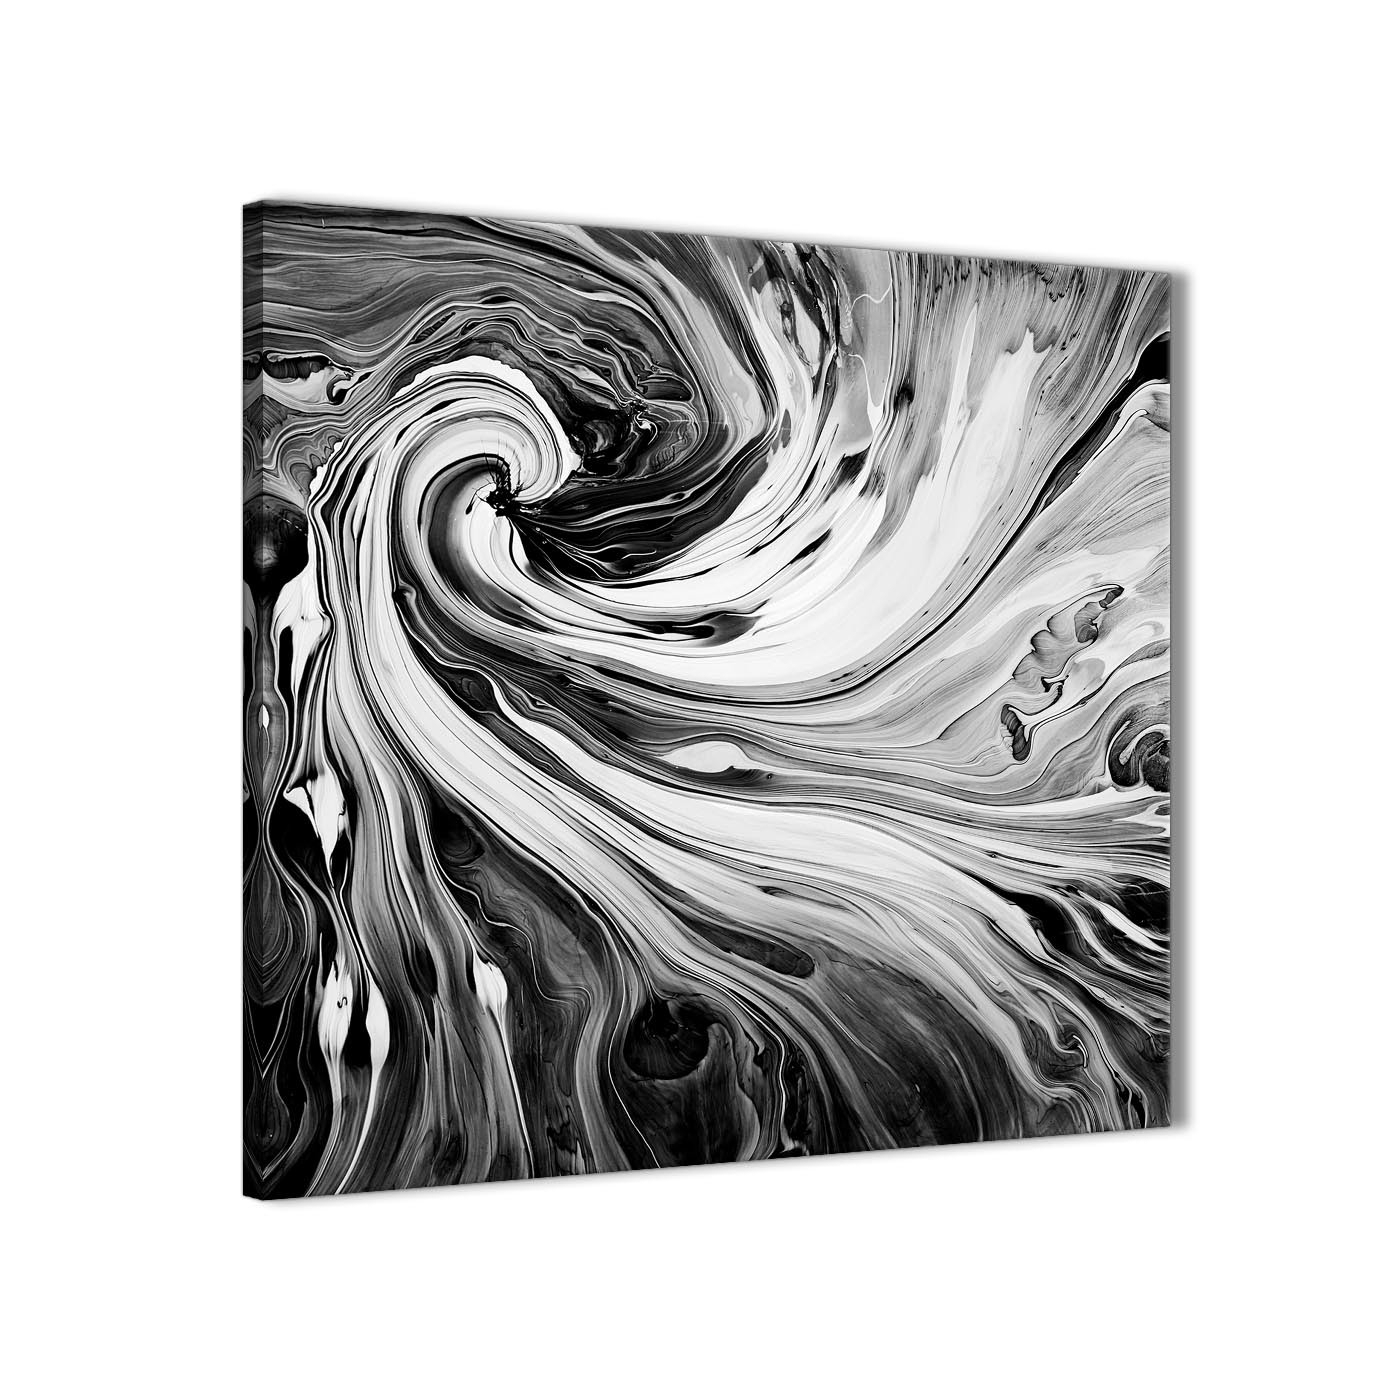 Black White Grey Swirls Modern Abstract Canvas Wall Art – 49cm For 2017 Grey Abstract Canvas Wall Art (View 12 of 20)